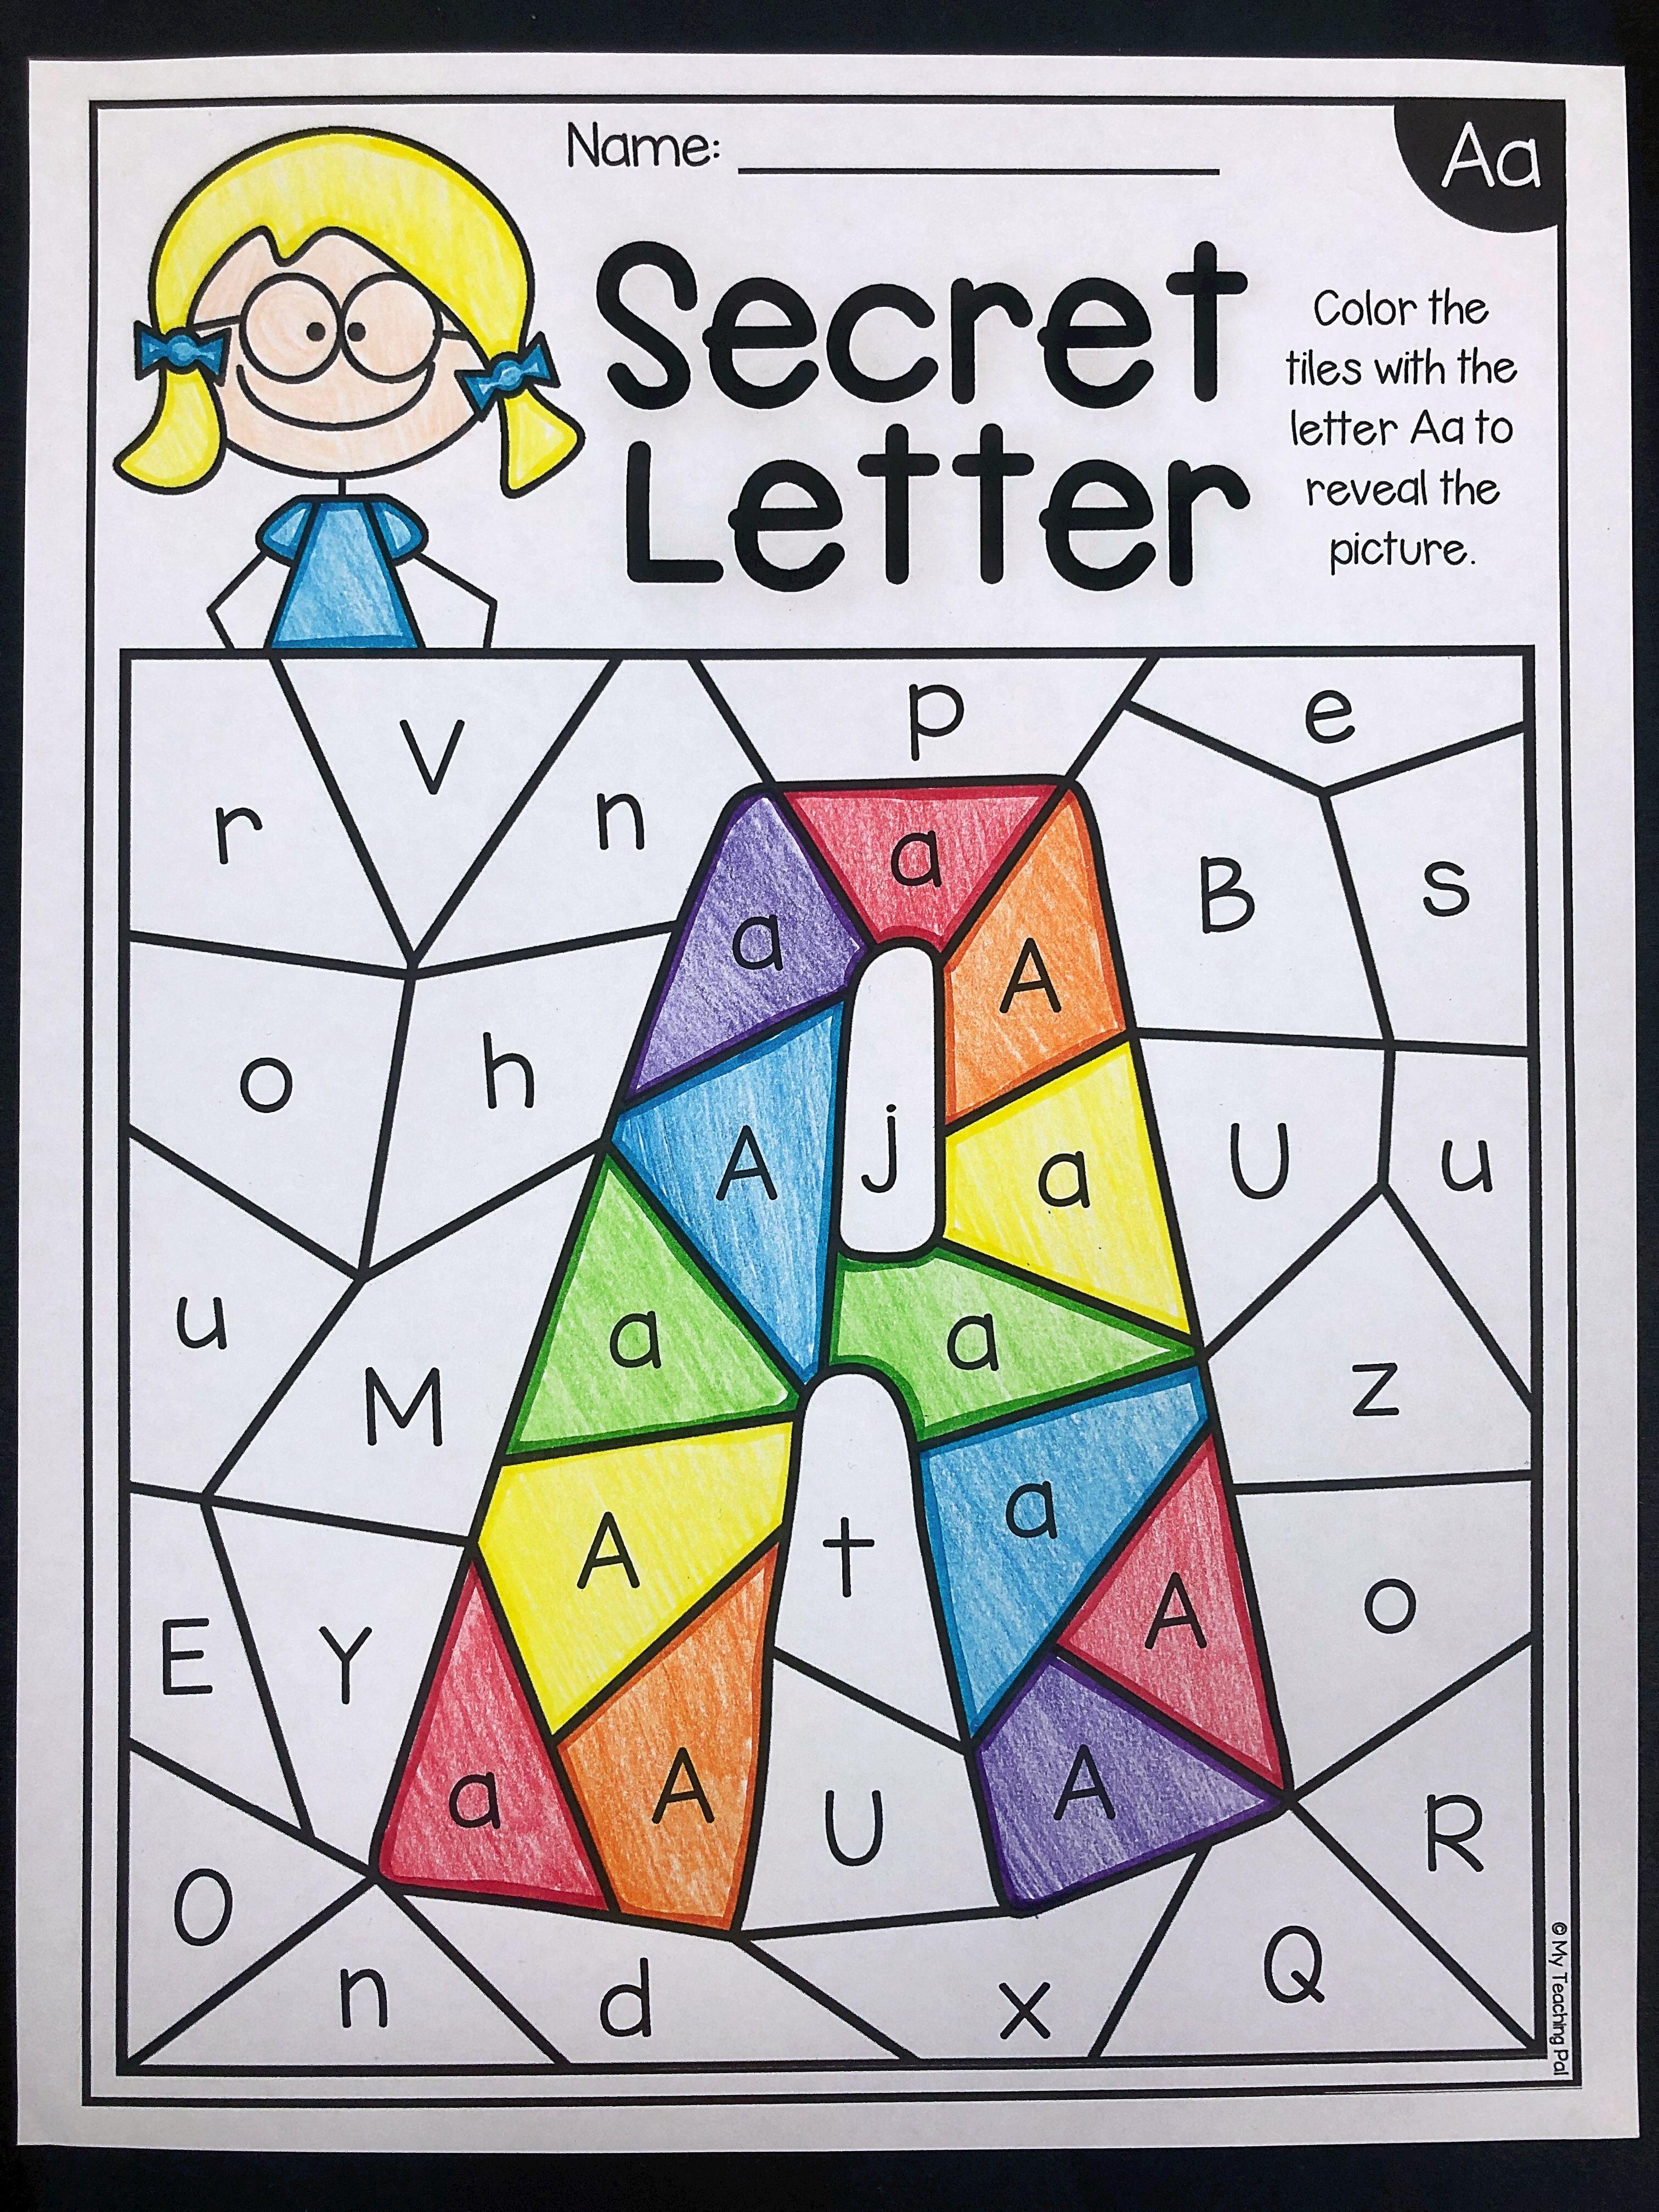 Predownload: Alphabet Identification Worksheets Secret Letter Alphabet Worksheets Kindergarten Alphabet Activities Preschool Preschool Letters [ 4032 x 3024 Pixel ]